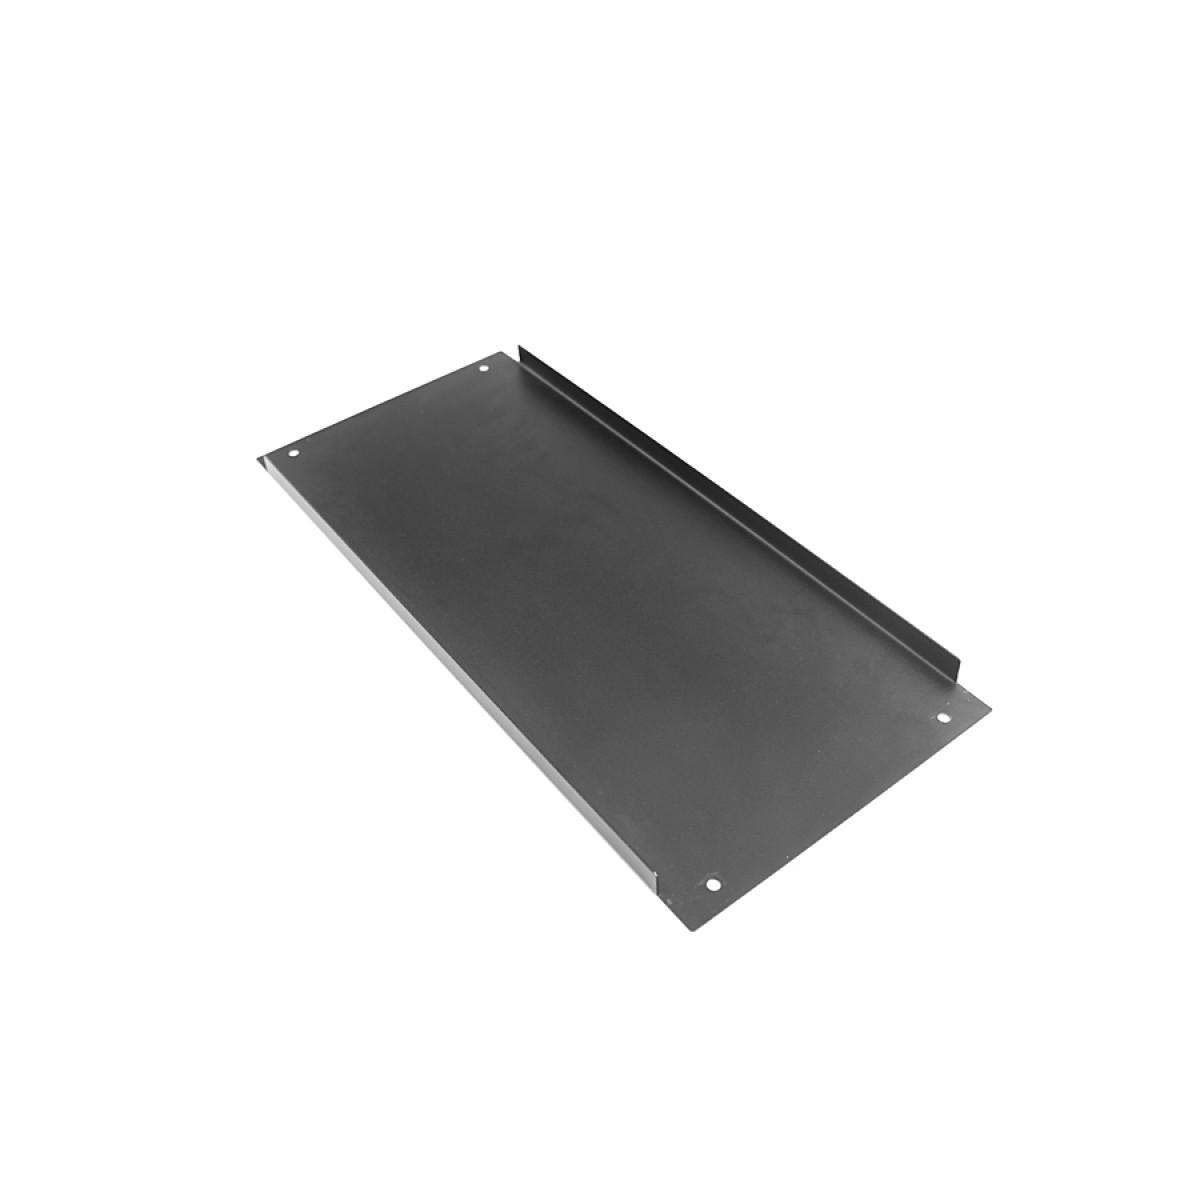 1NPD04400N - 4U Krabice s chladičem, 400mm, 10mm-panel černý